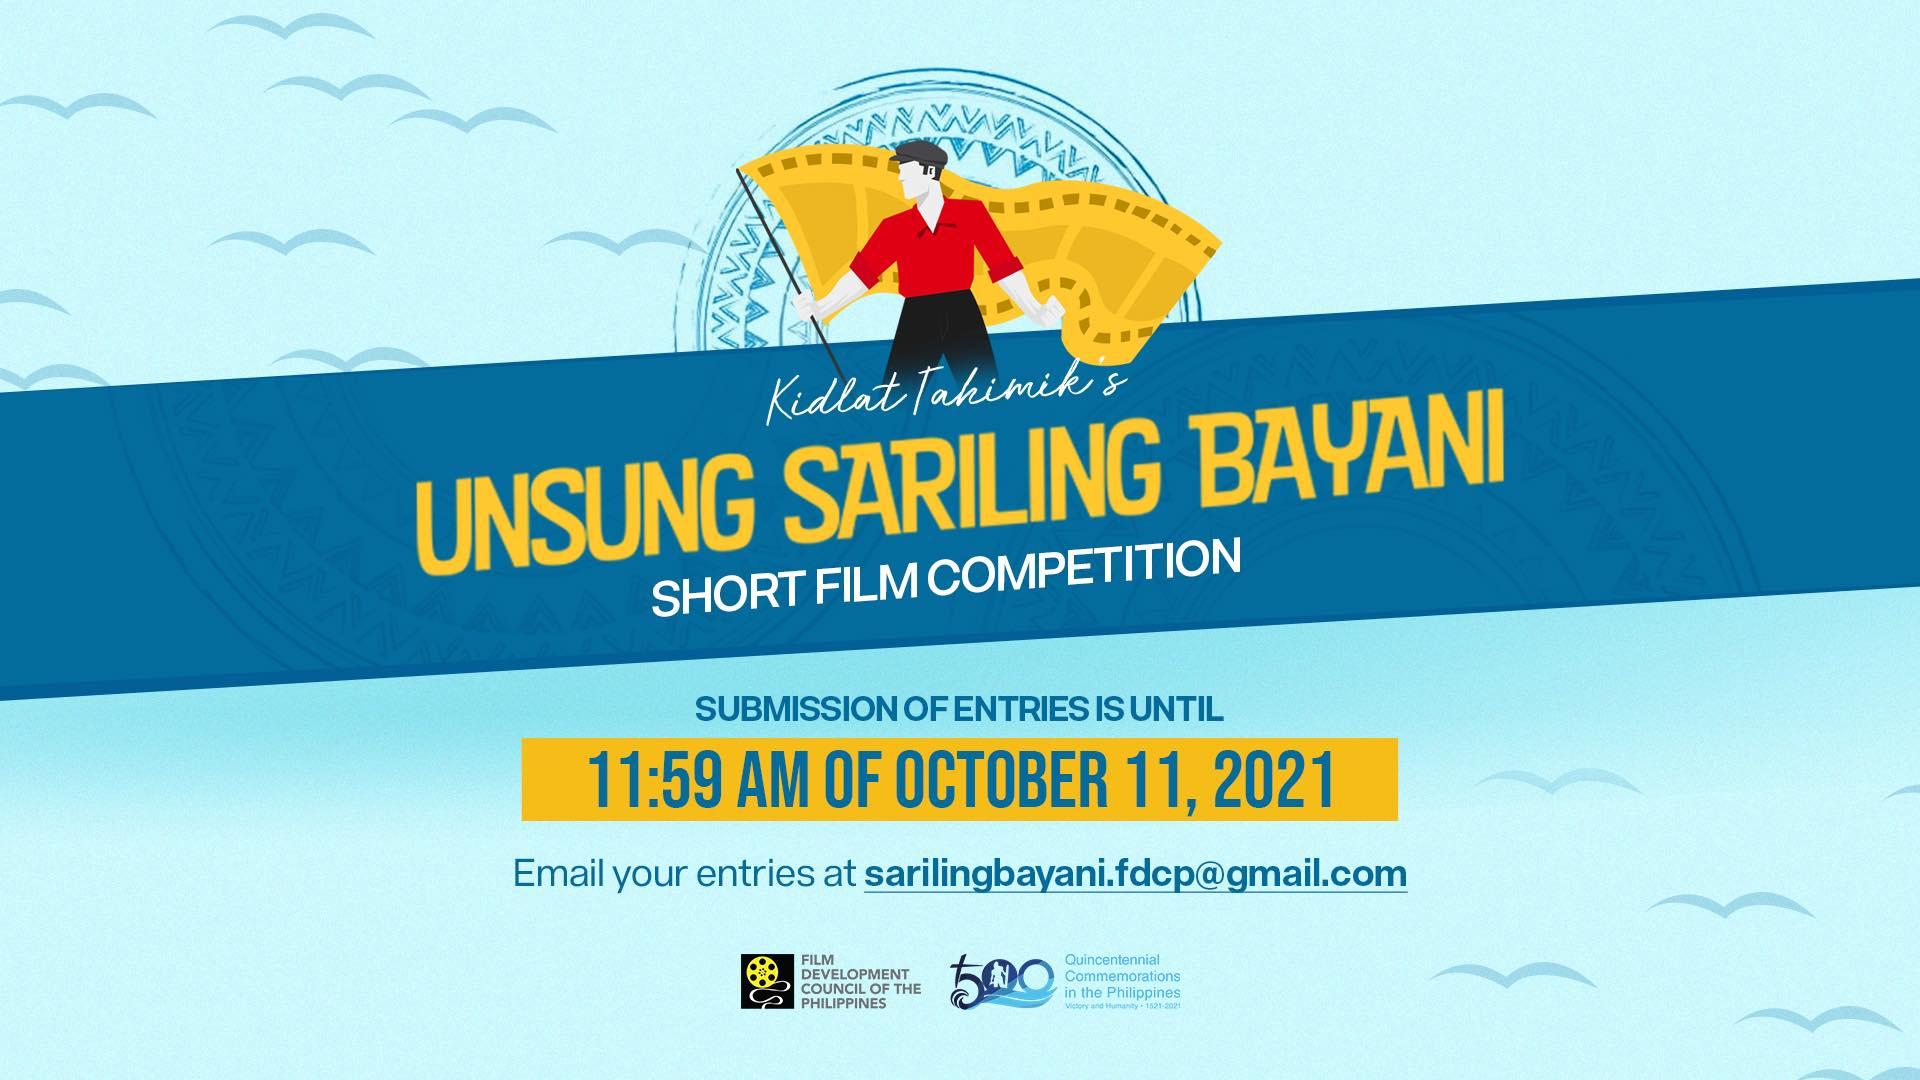 FDCP Kidlat Tahimik's Unsung Sariling Bayani (USB) Short Film Competition